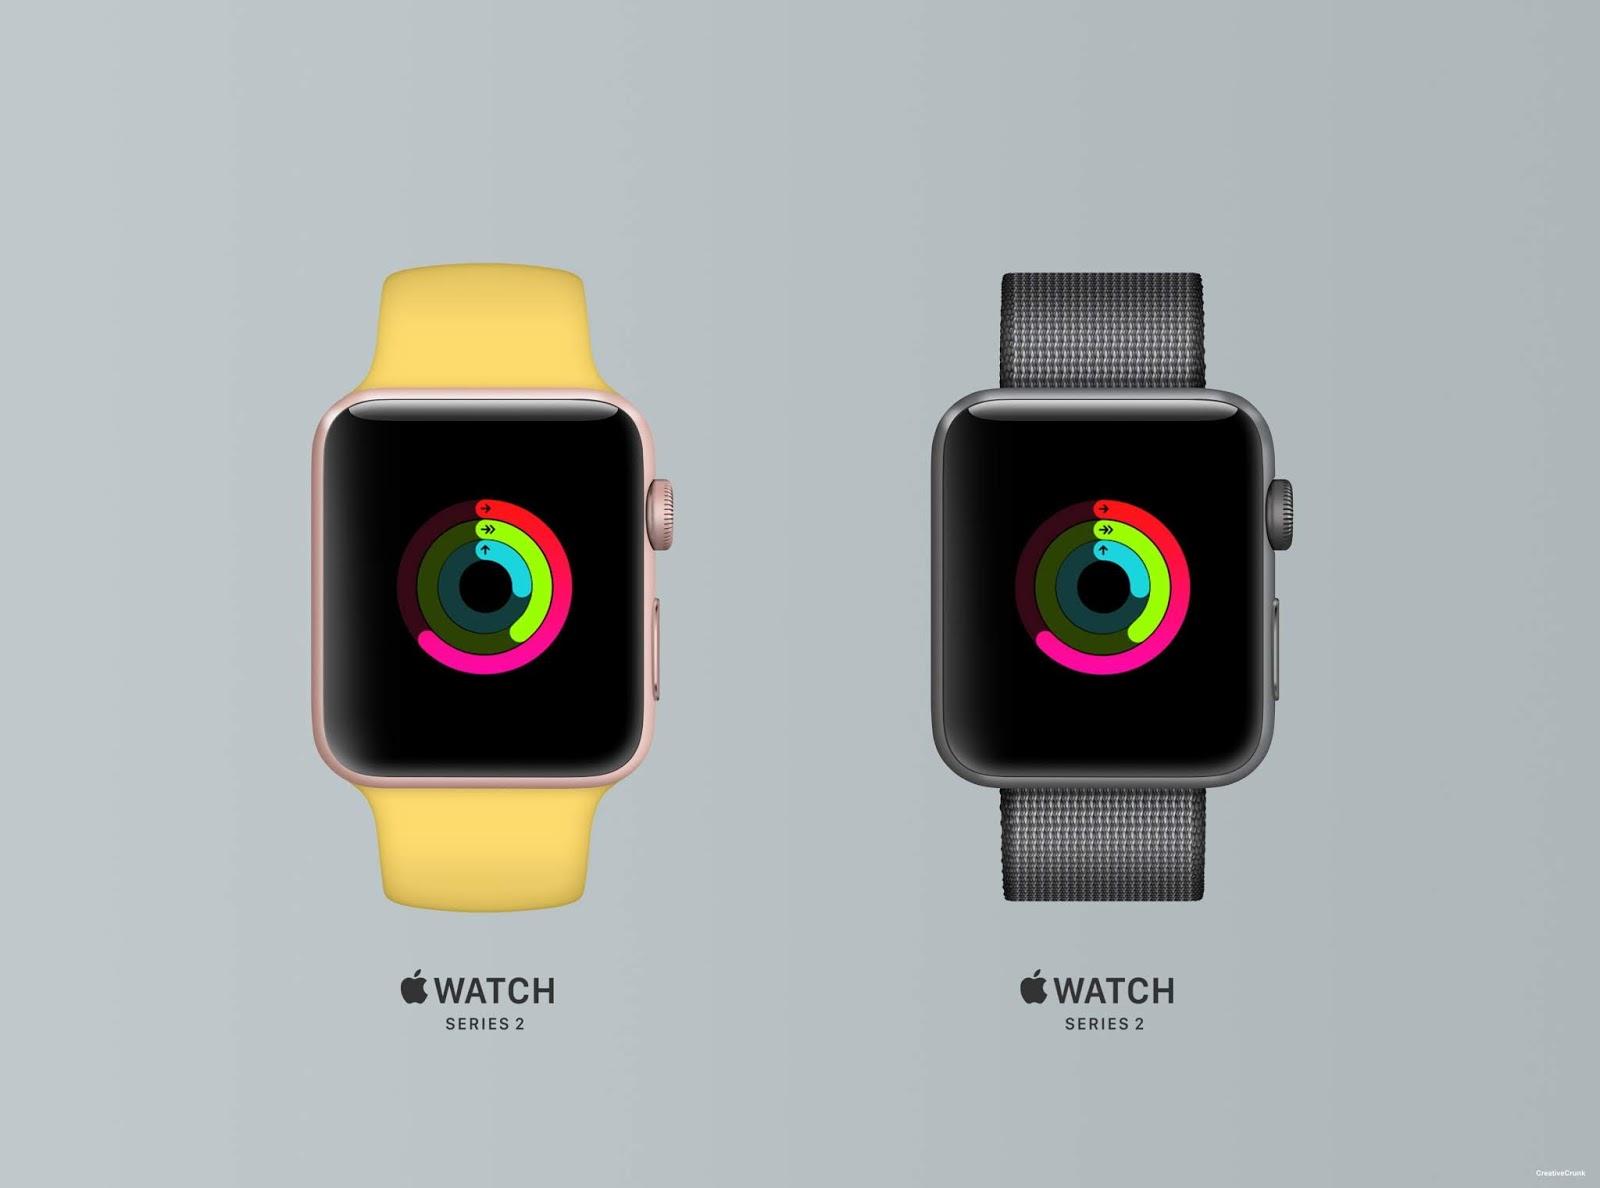 apple watch series 2 4k hd high wallpapers